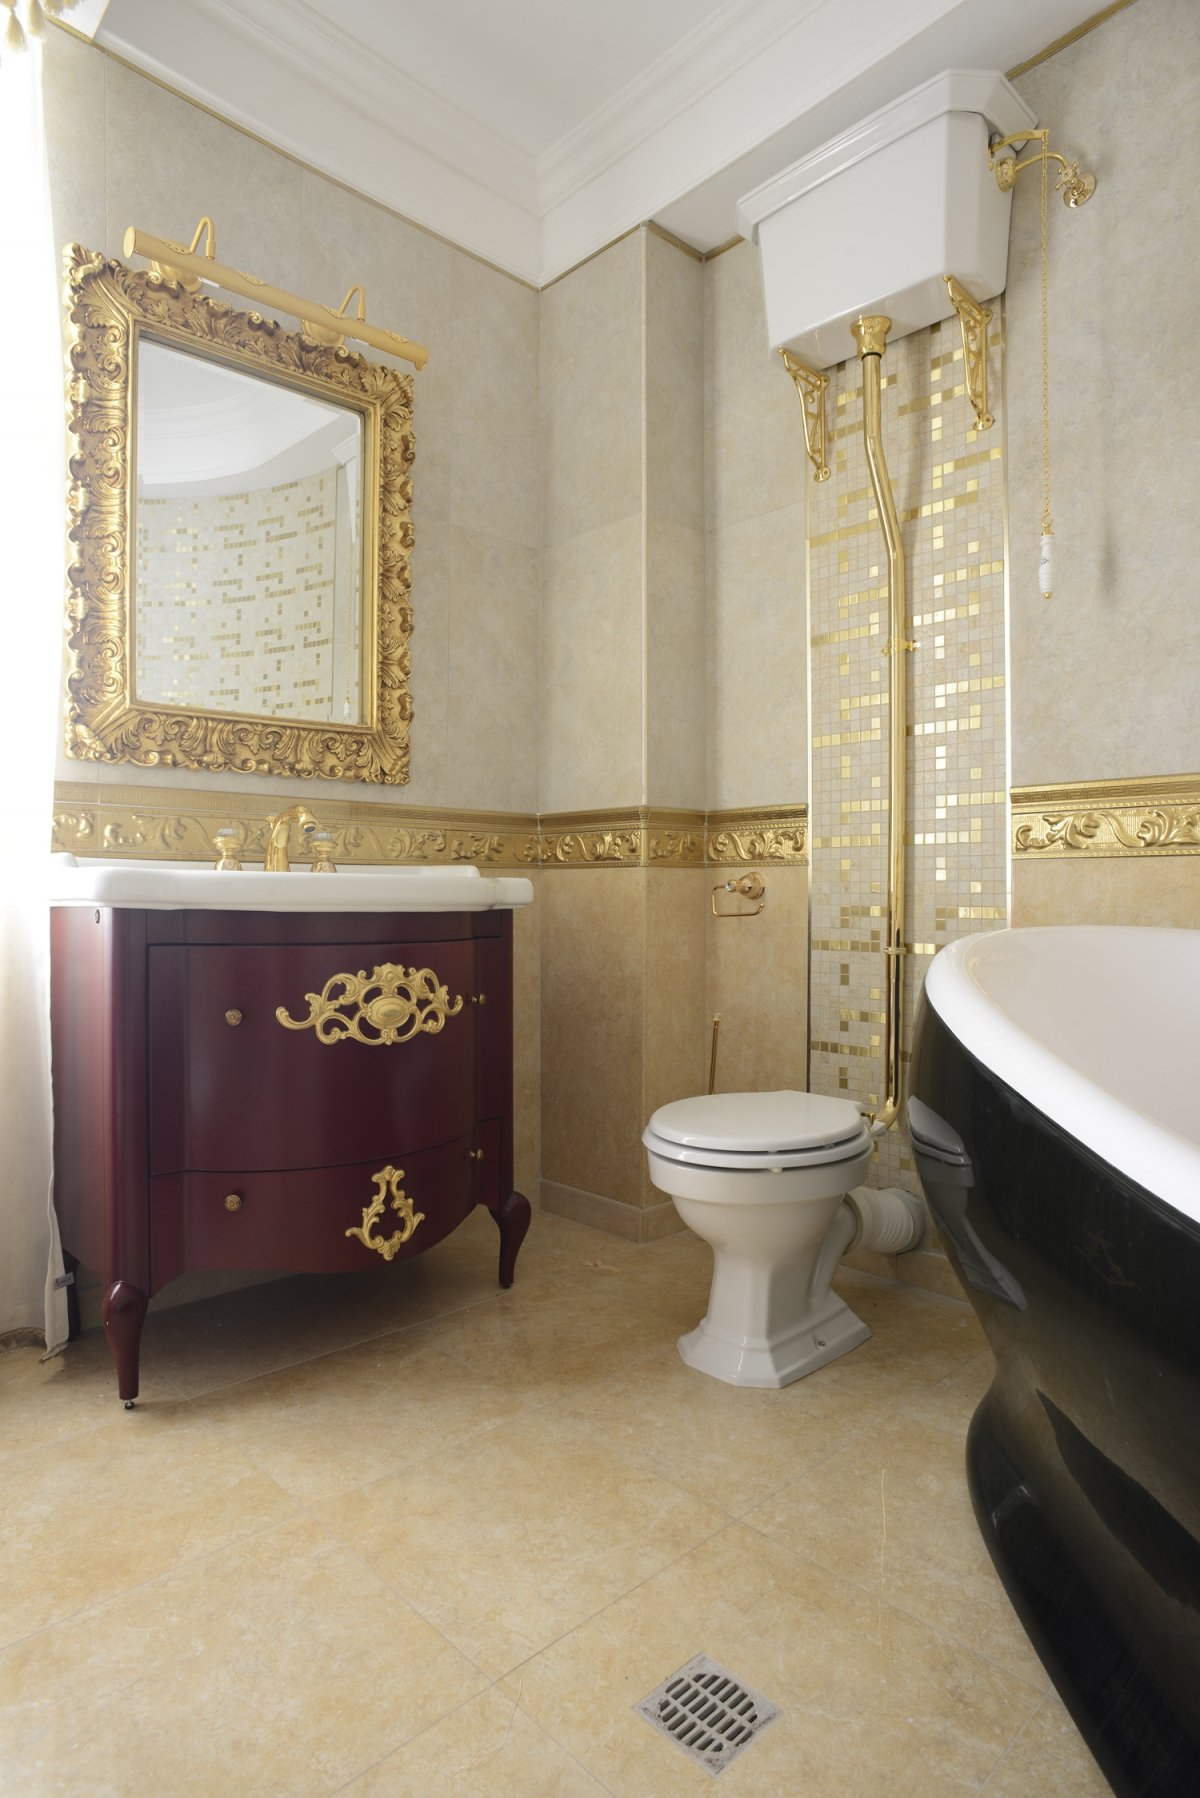 Design-Interior-Si-Amenajare-Interioara-Pentru-O-Casa-Chic-11